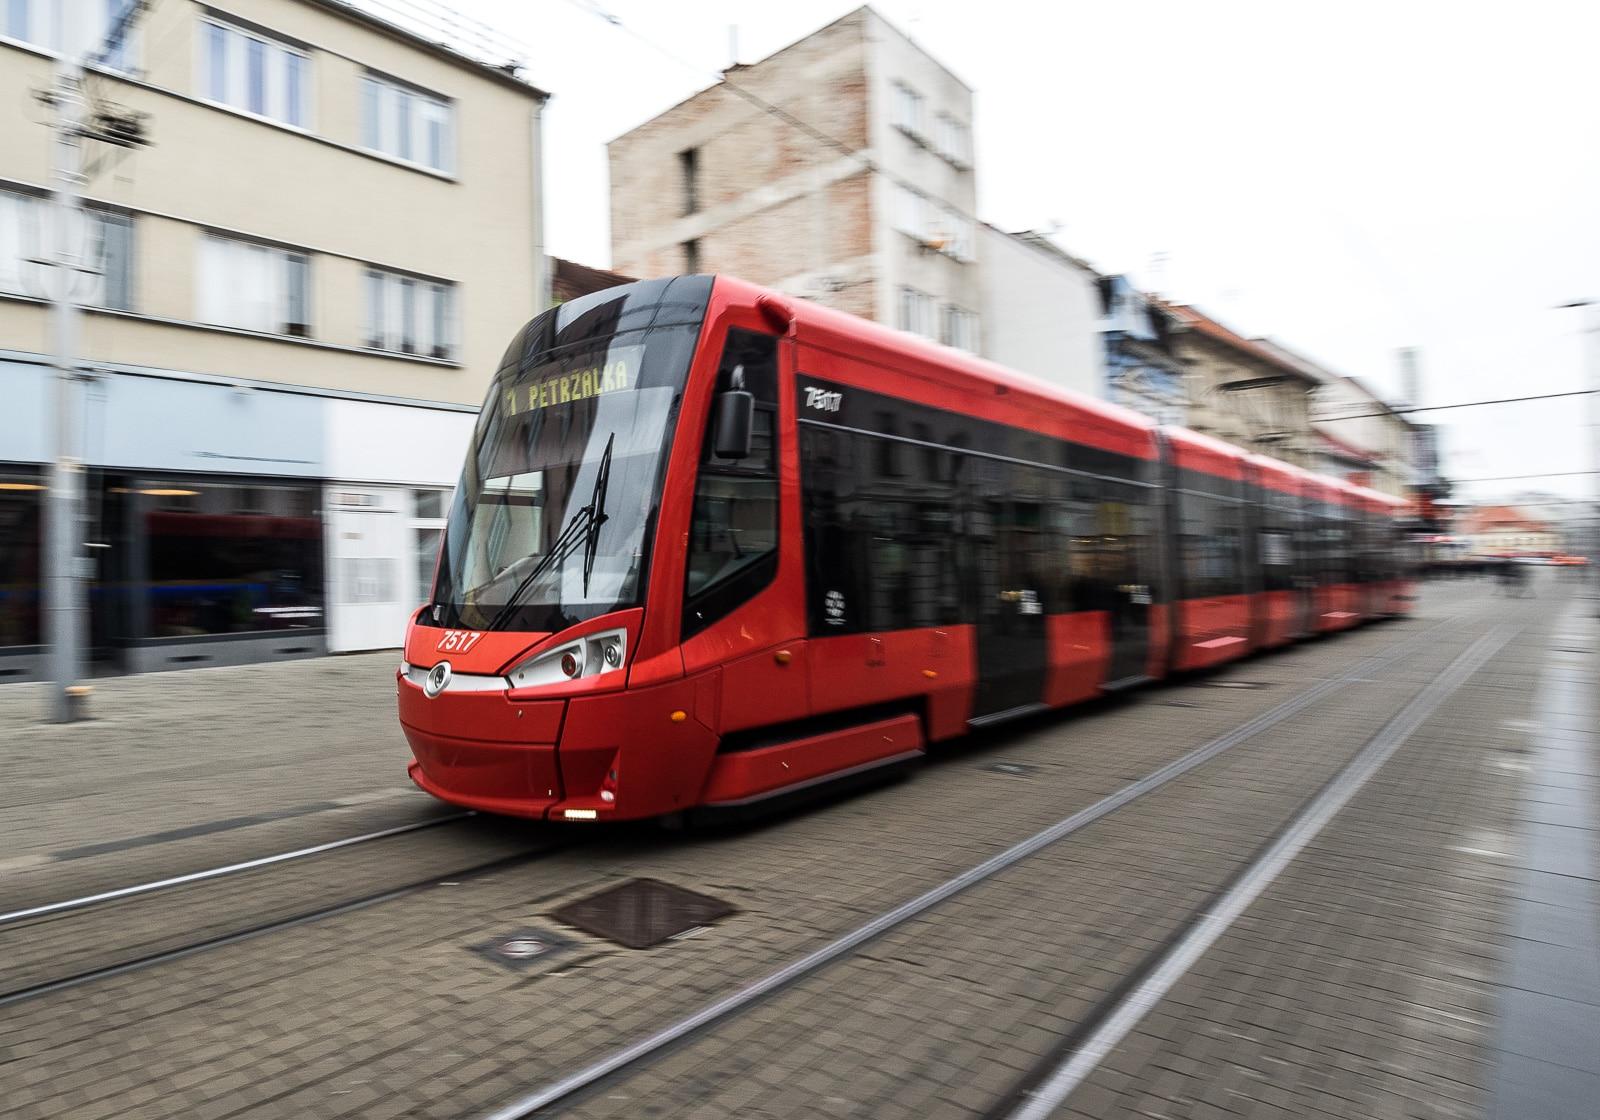 A red Skoda tram on a cobblestone street in Bratislava